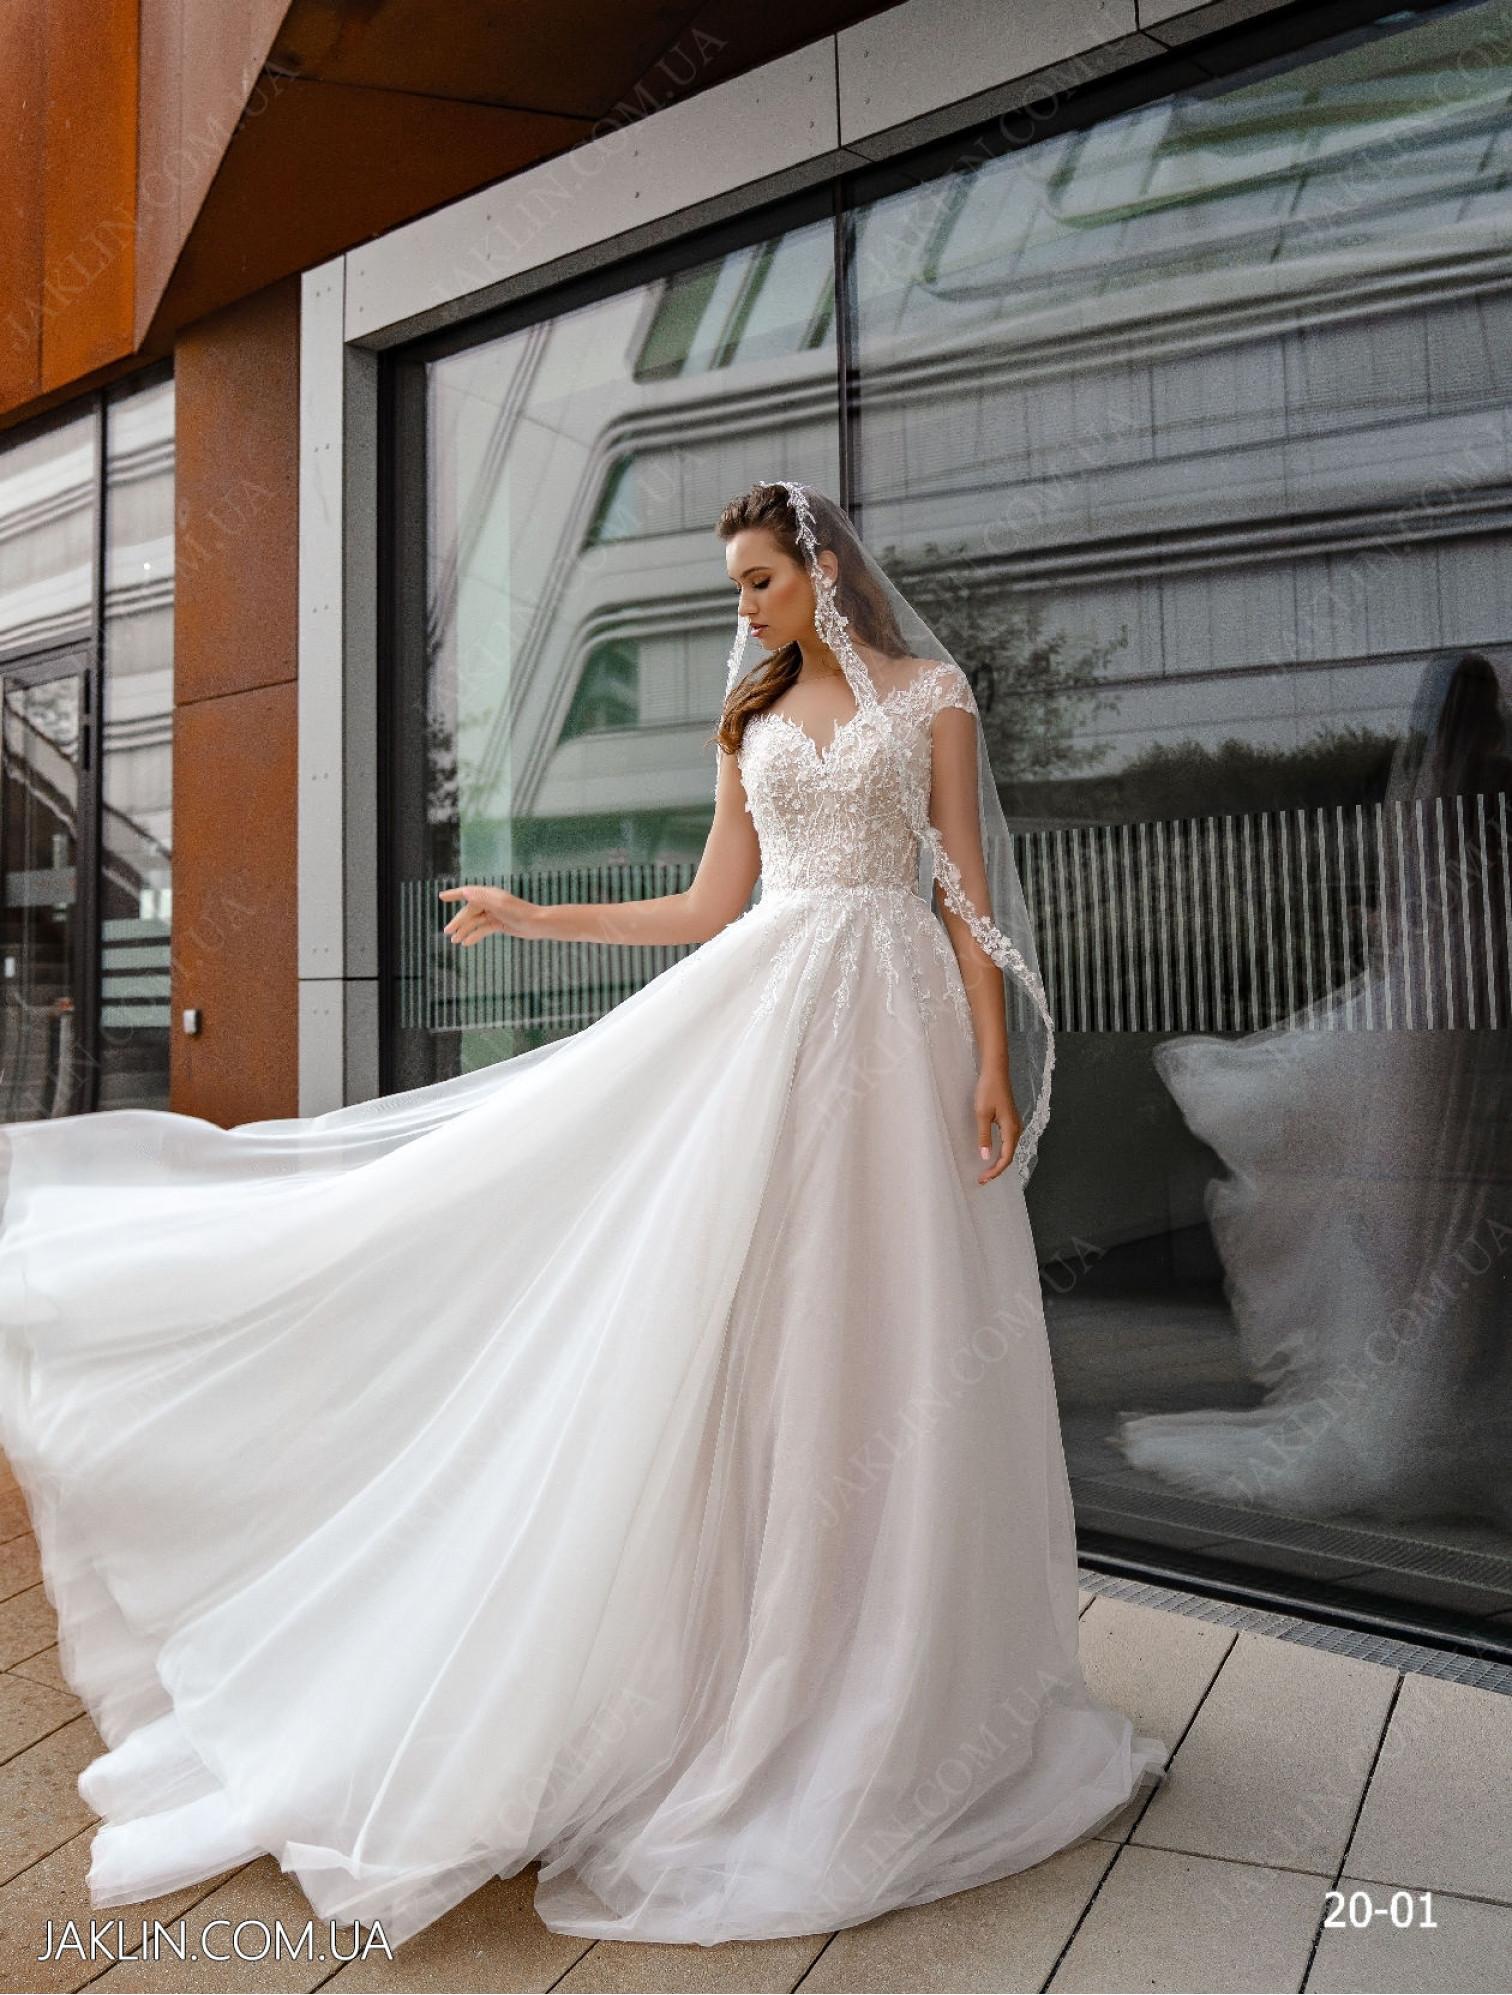 Wedding dress 20-01